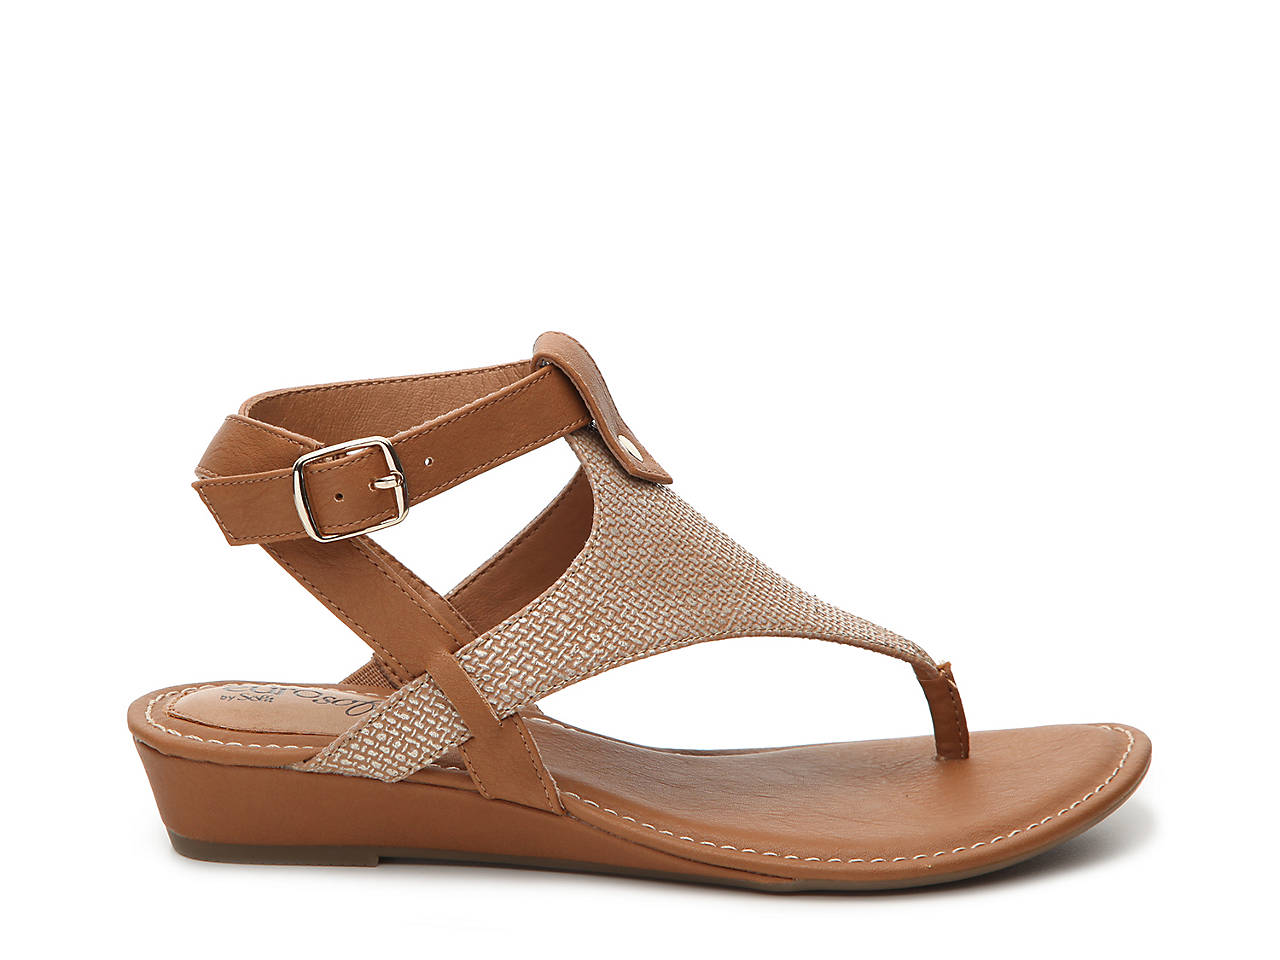 ab56b4f9215 Eurosoft Missy Wedge Sandal Women s Shoes